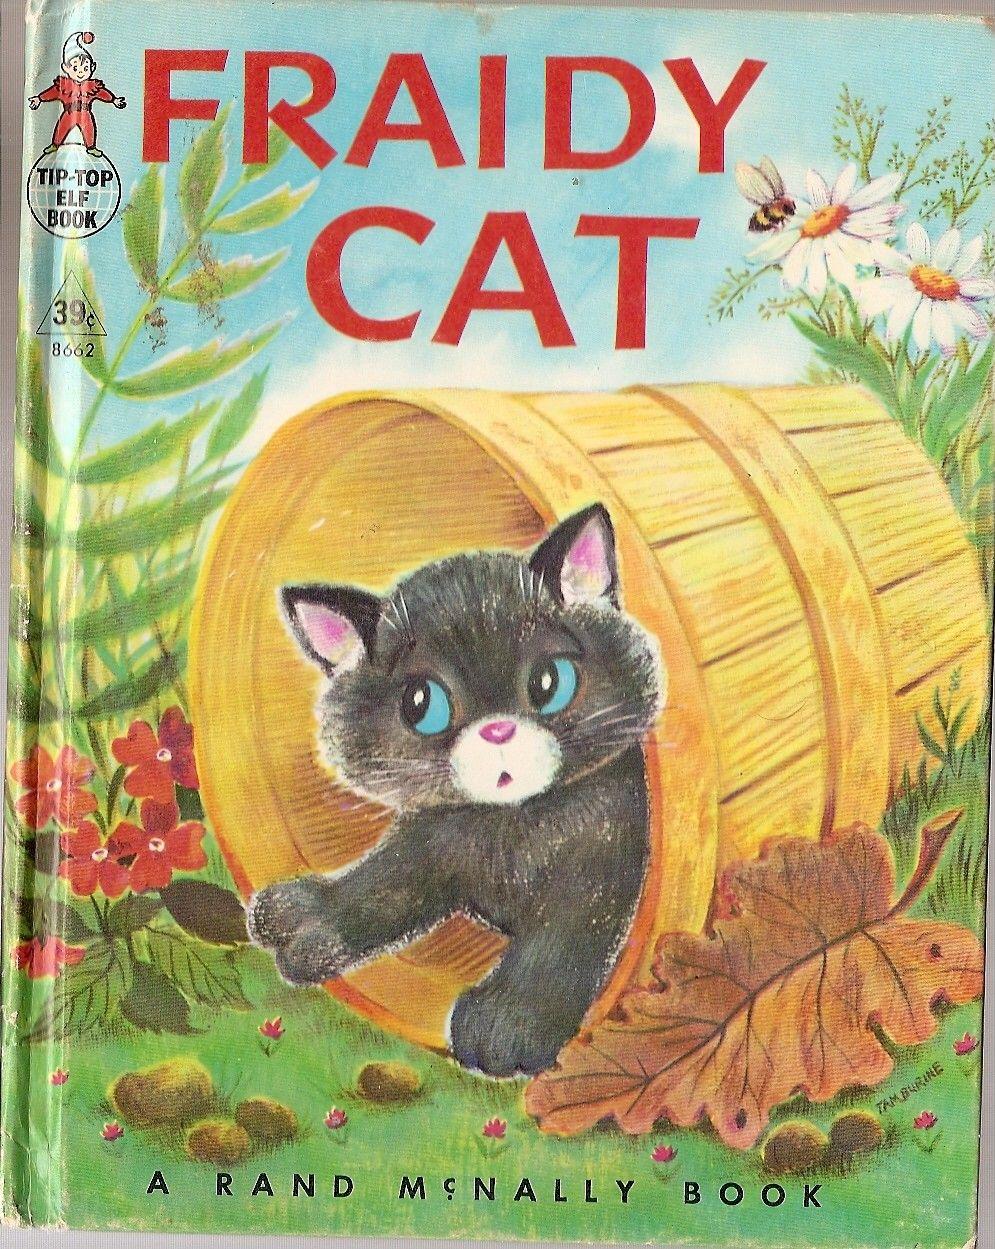 Fraidy cat rand mc nally vintage childrens book old